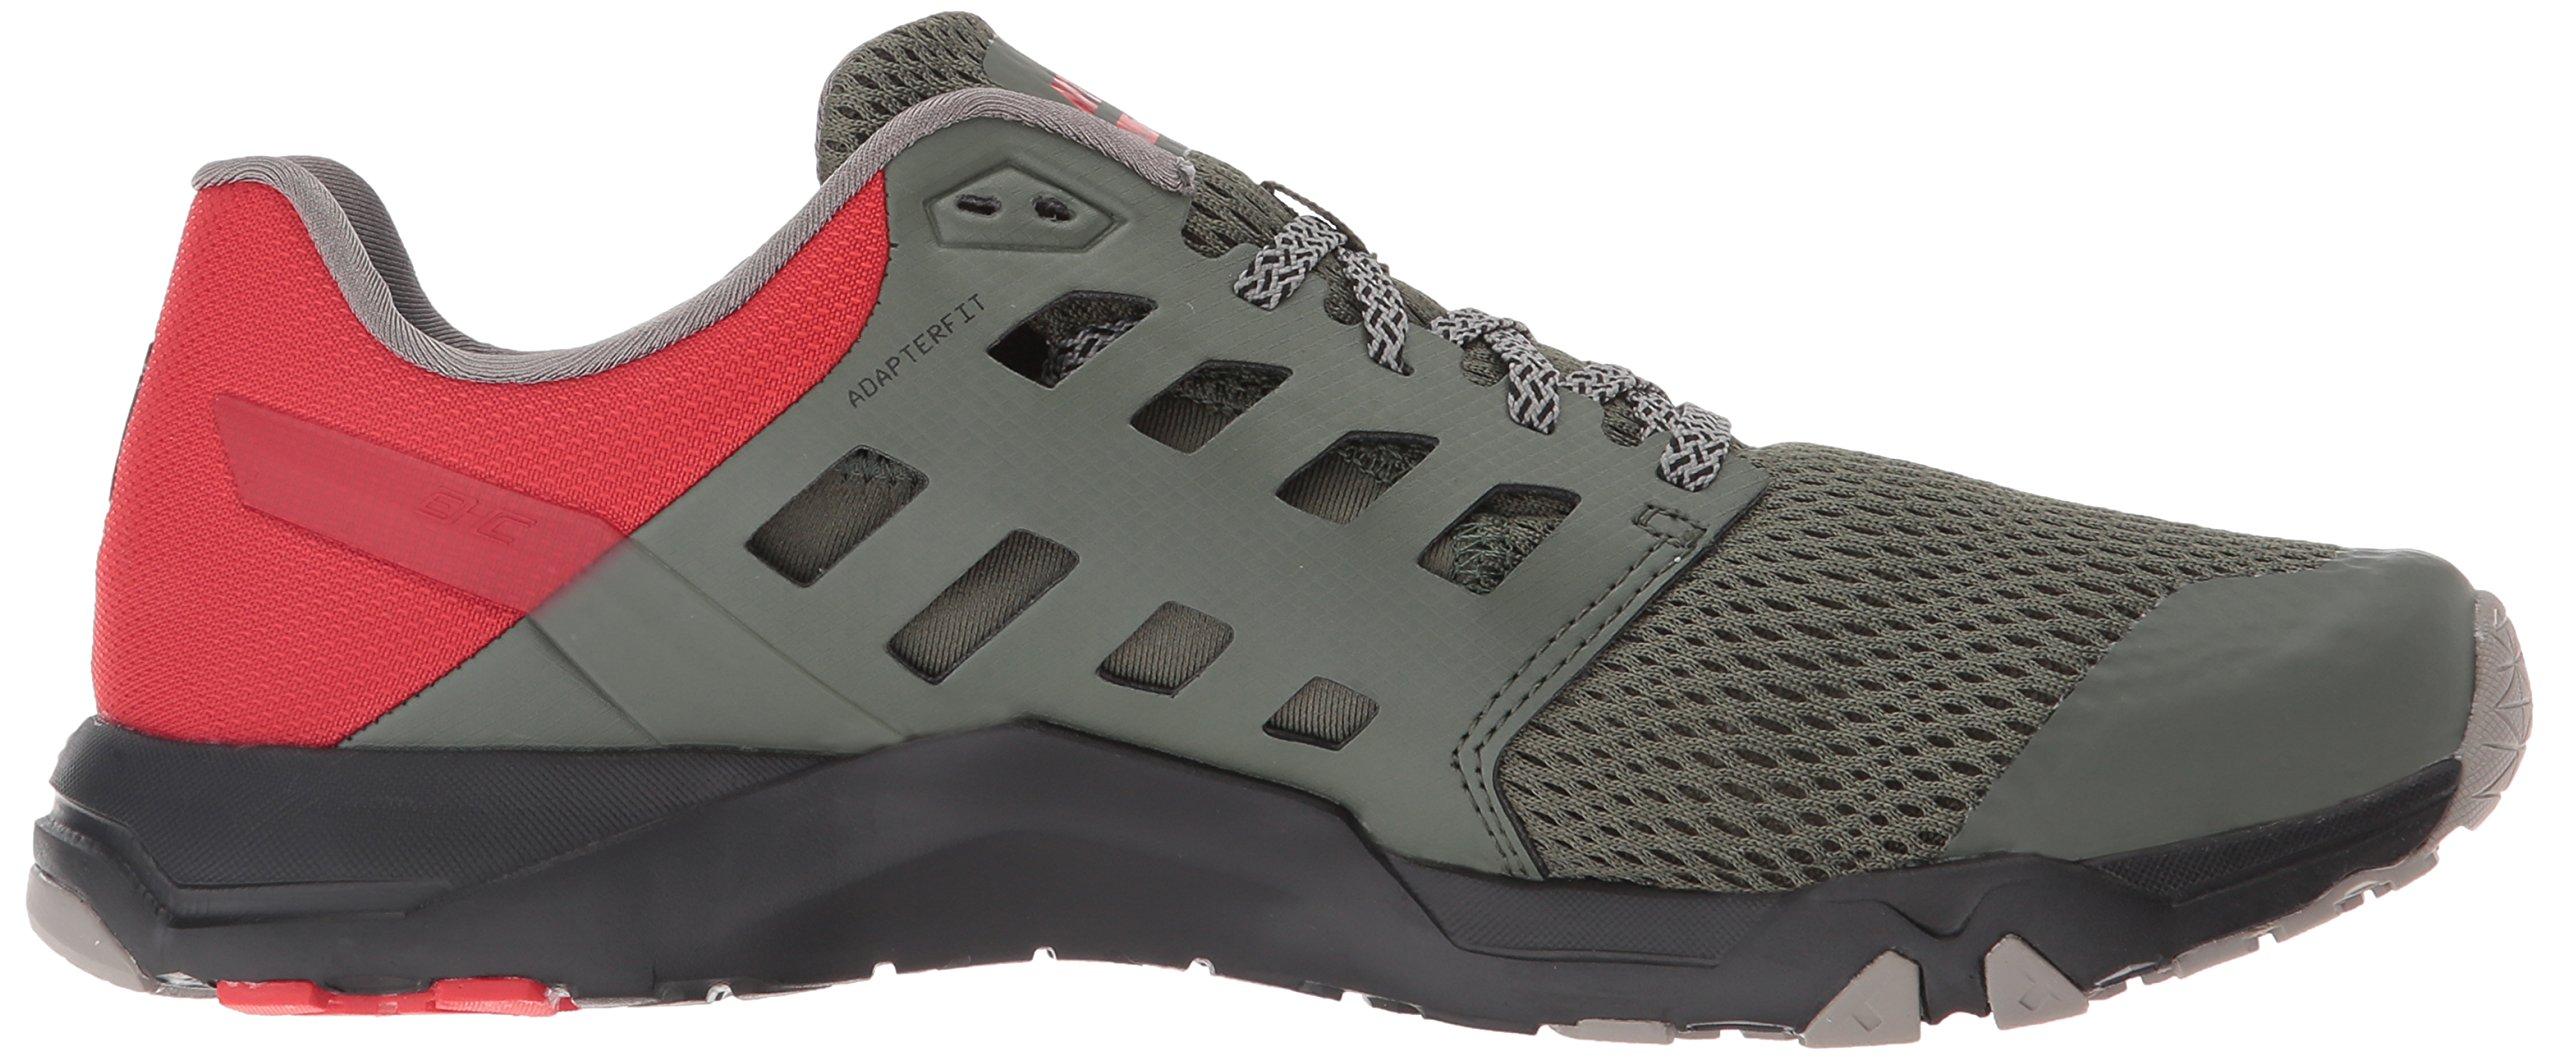 Inov-8 Men's All Train 215 Cross-Trainer Shoe, Dark Green/Red/Black, 12 D US by Inov-8 (Image #7)